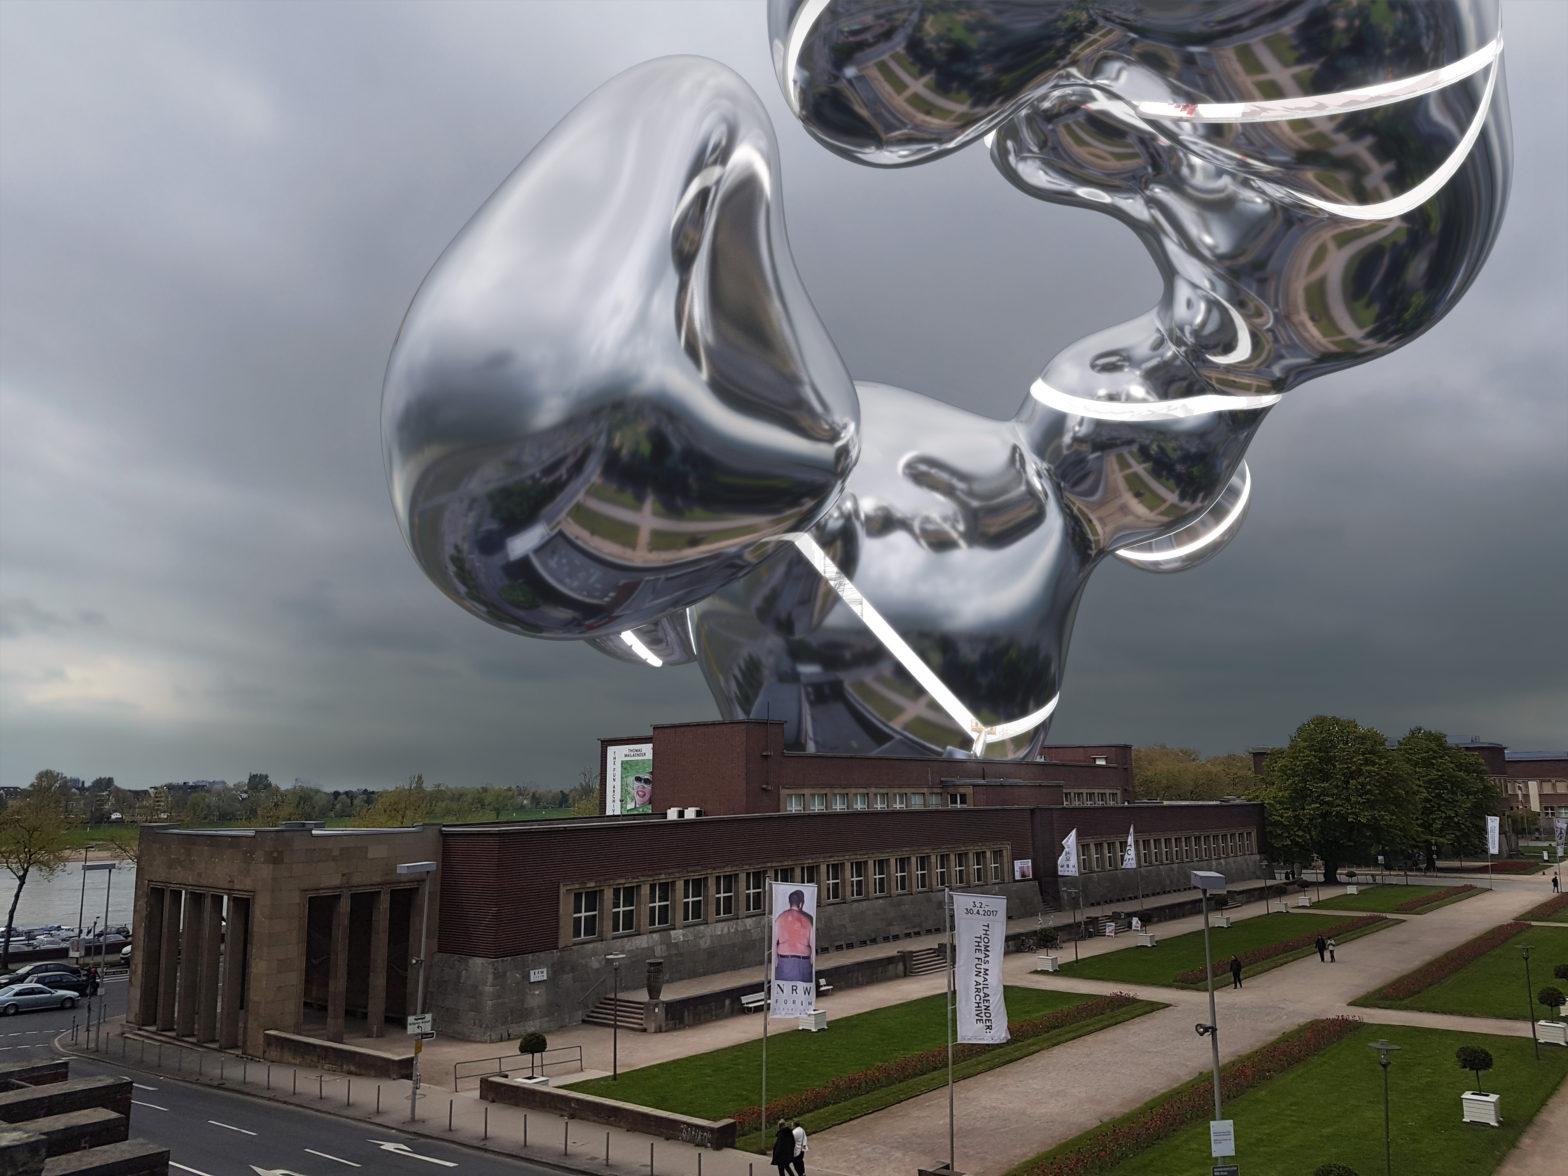 NRW-Forum Extension, Main Image